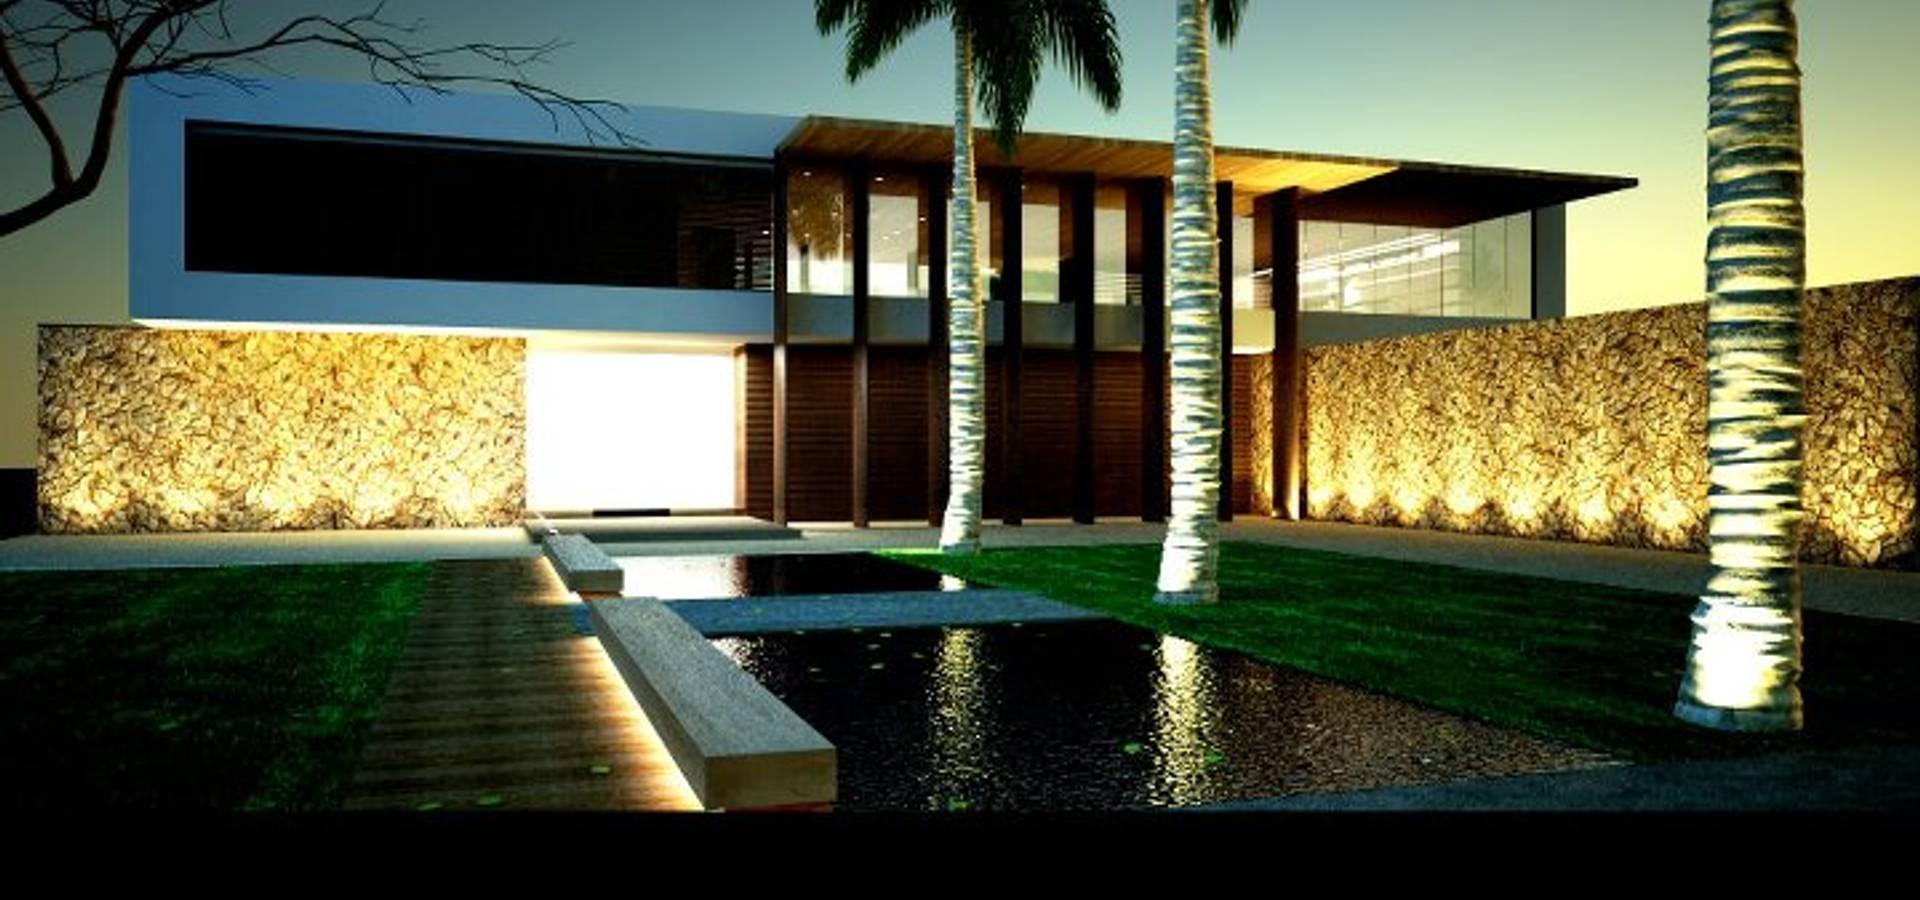 gorios neto arquitetura33